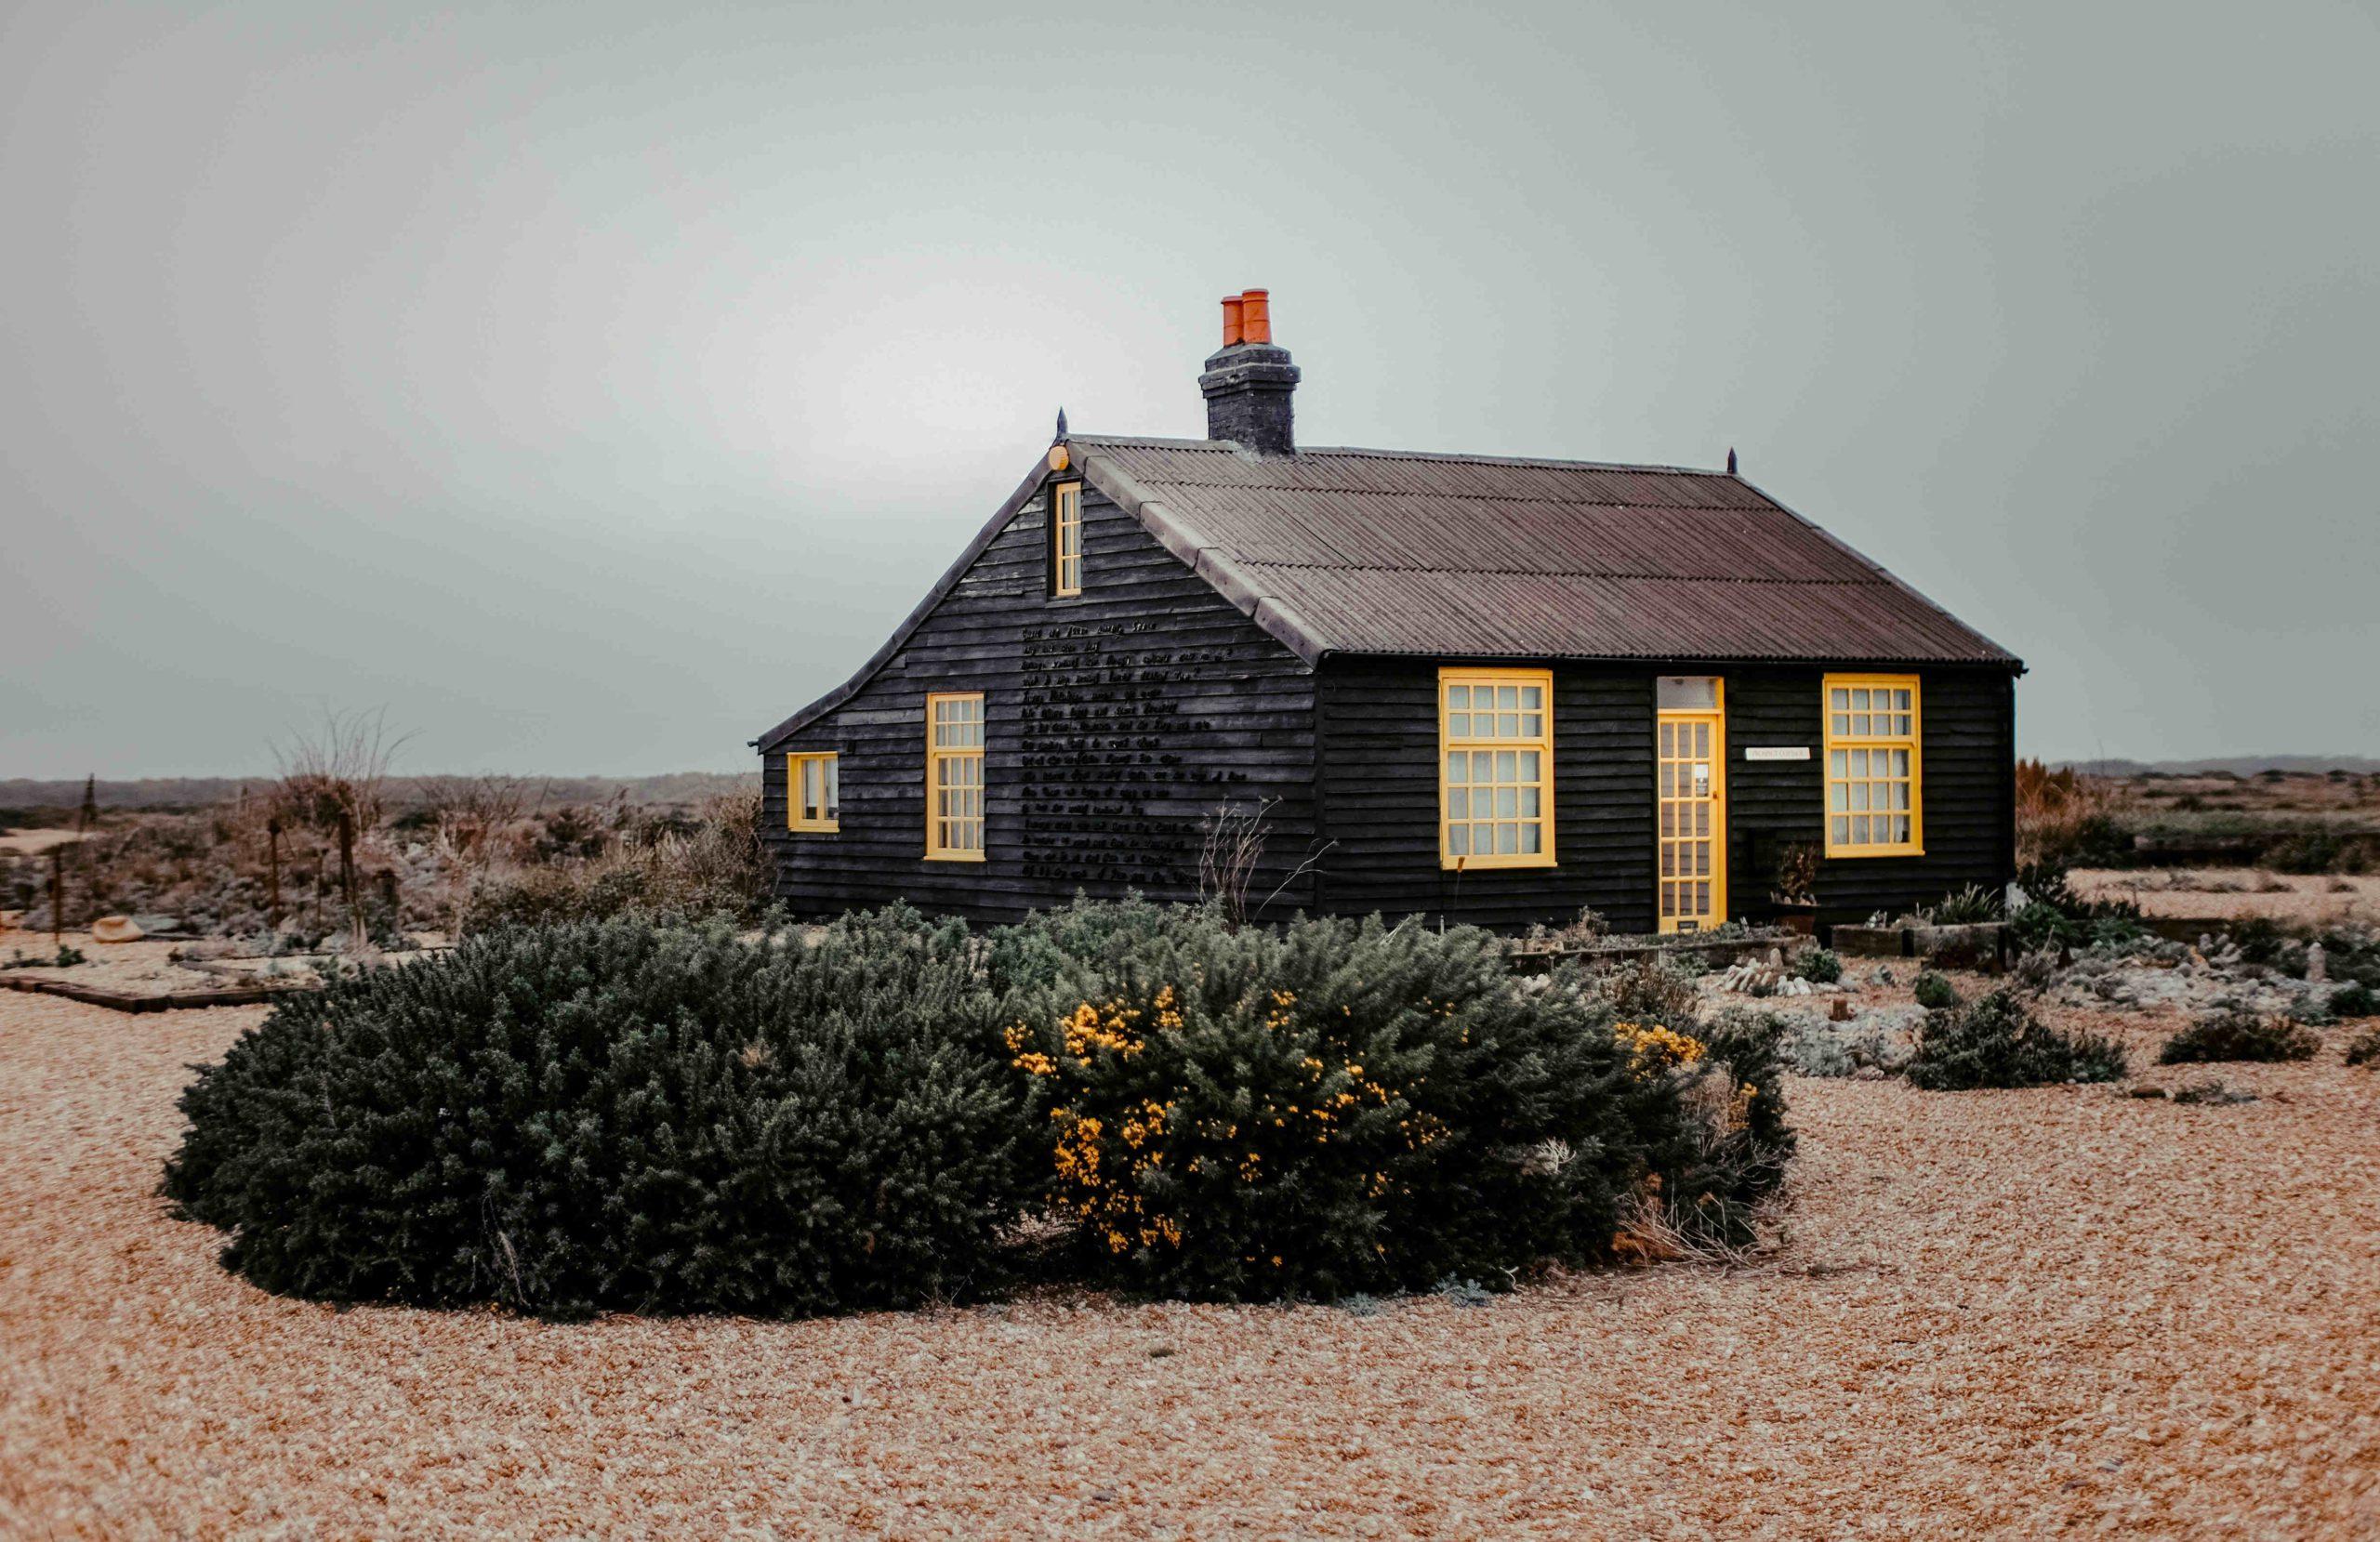 Prospect Cottage credit Zoltan Tasi